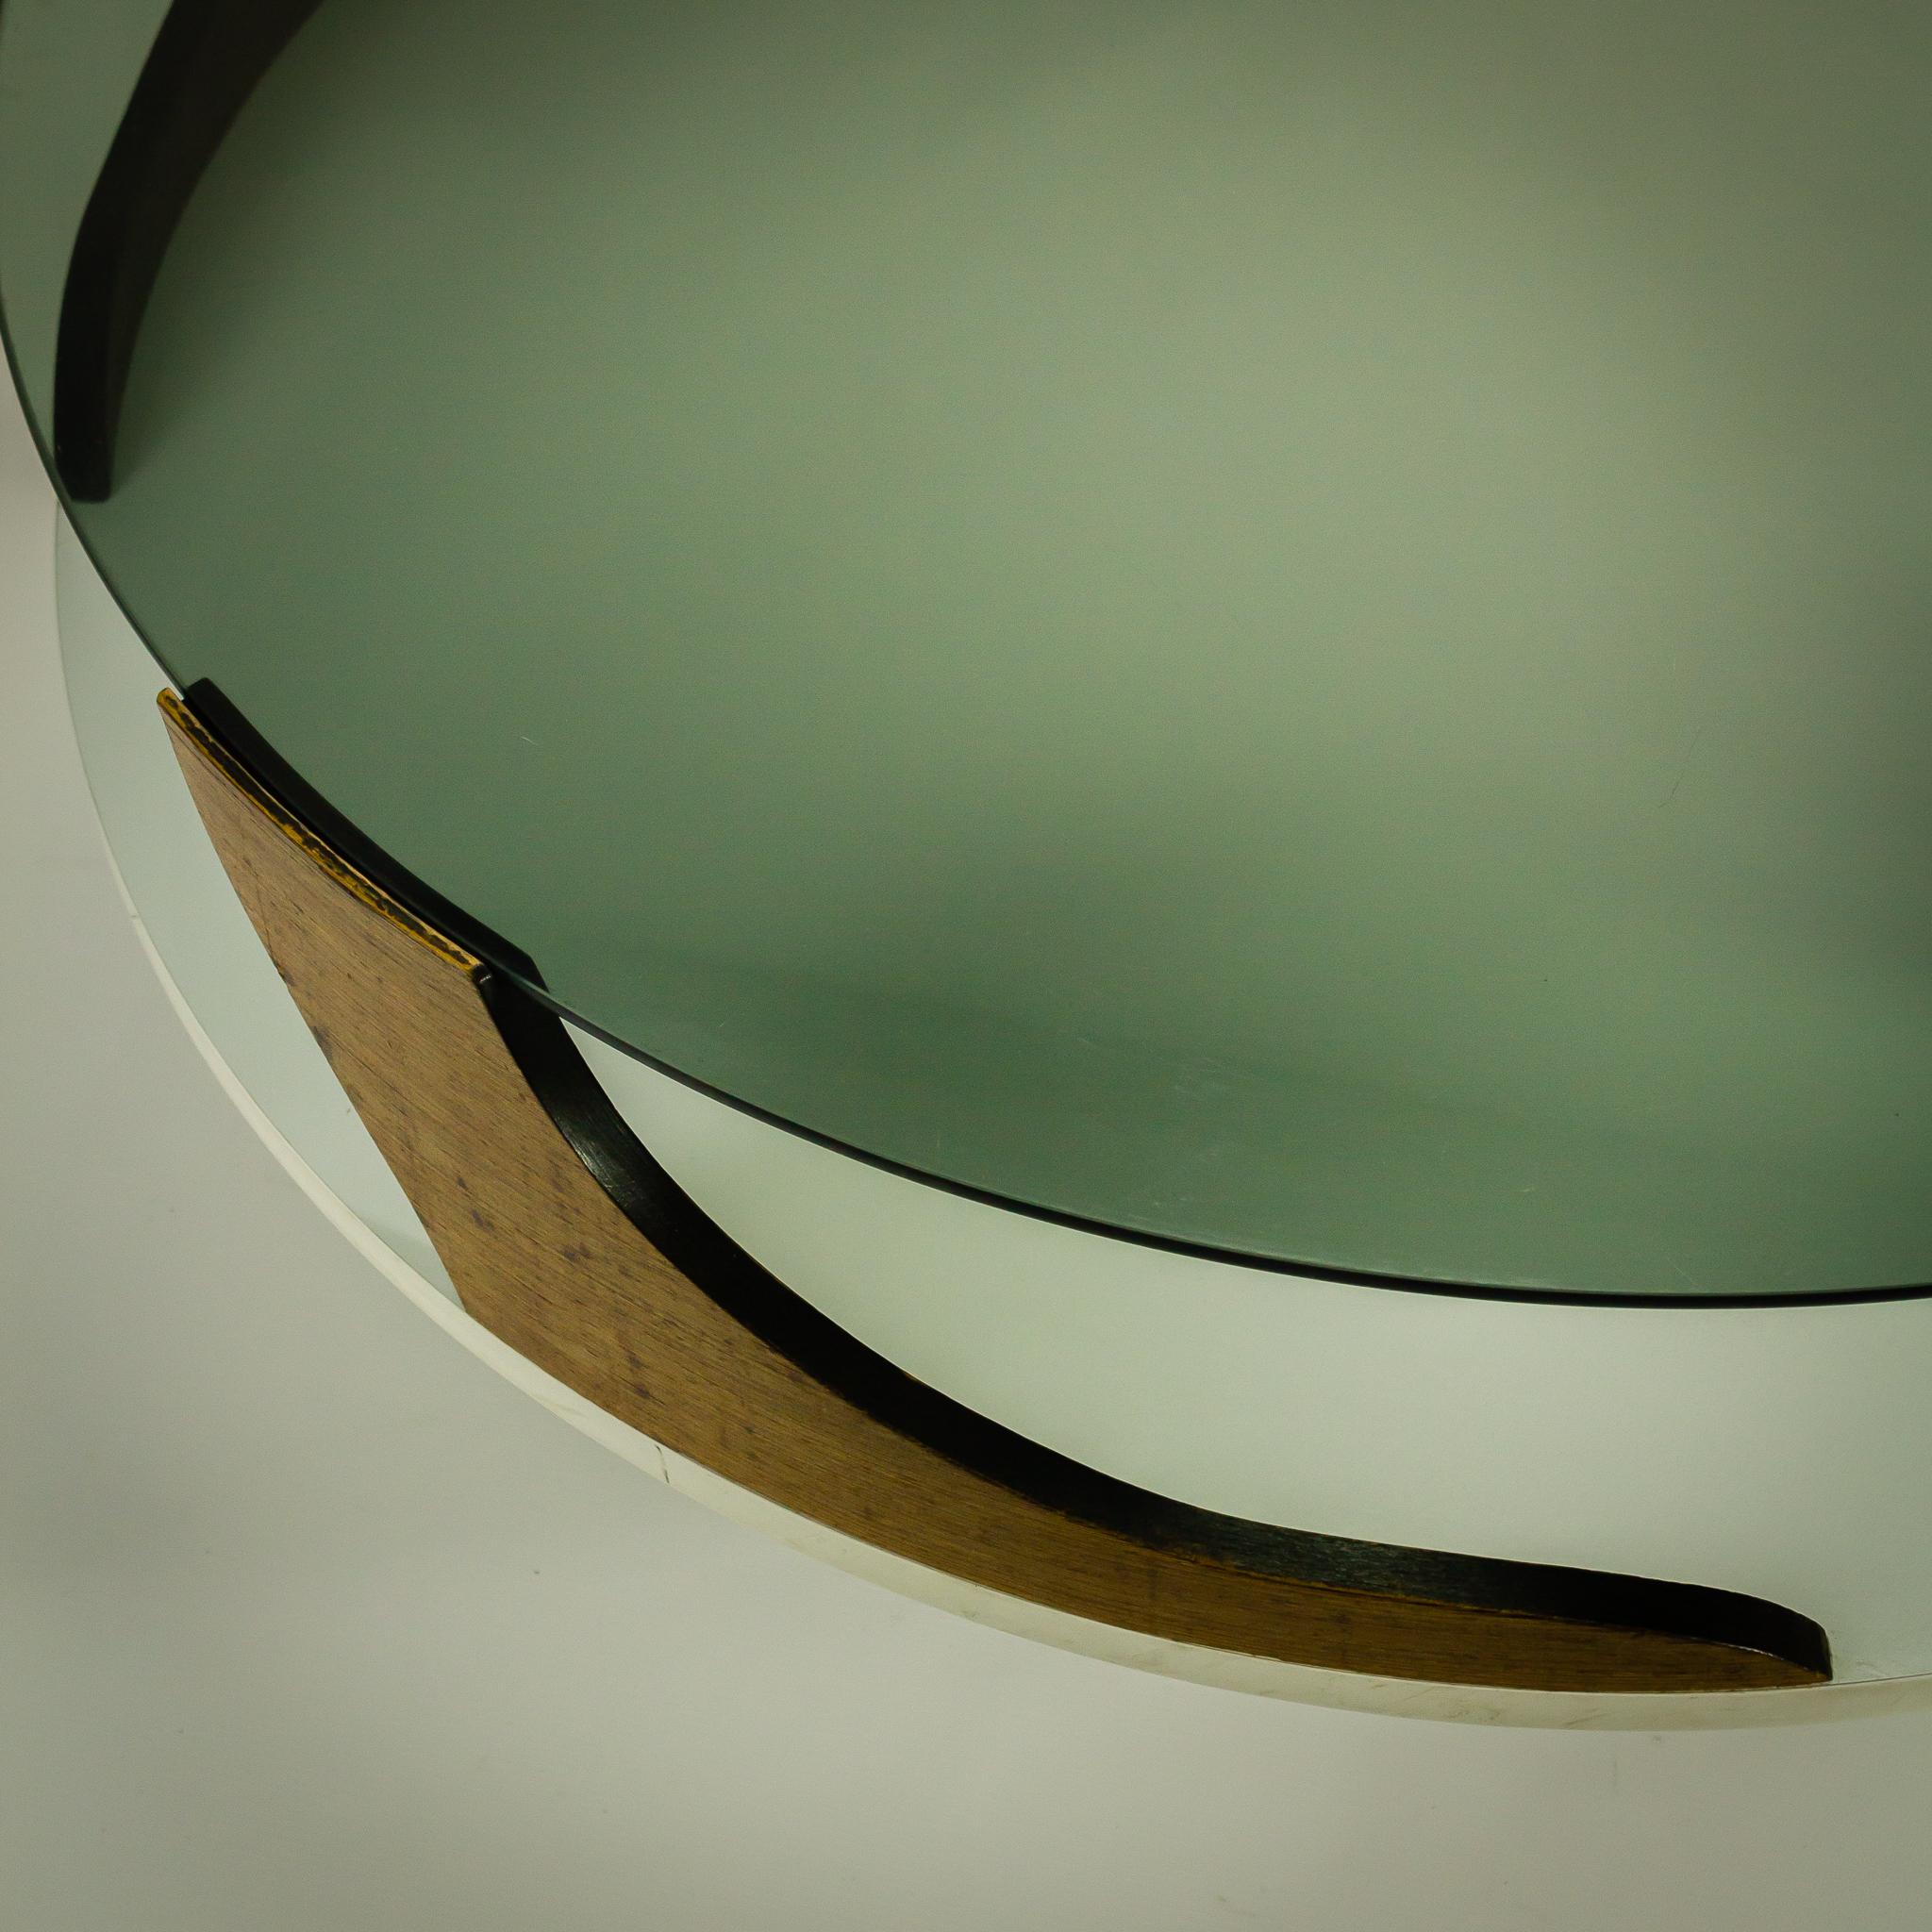 Witte Salon Tafel Met Glas.70 S Space Age Salontafel Wenge Wit Glas Barbmama